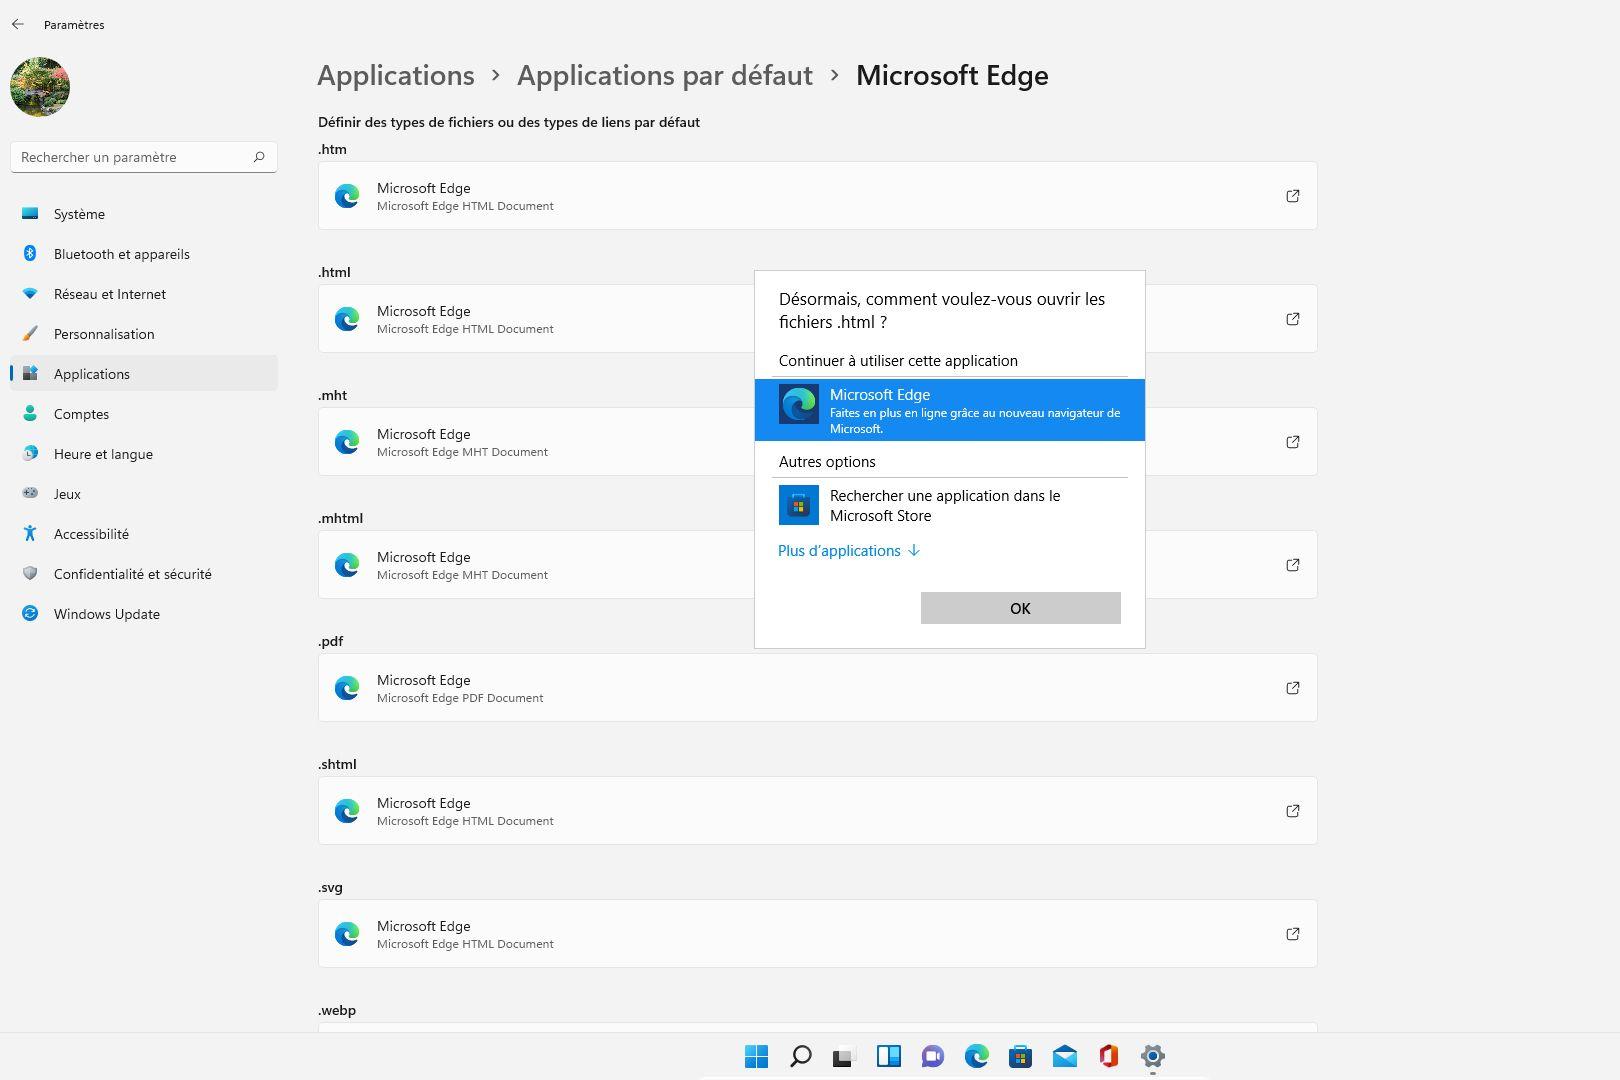 windows-11-applications-defaut-microsoft-edge